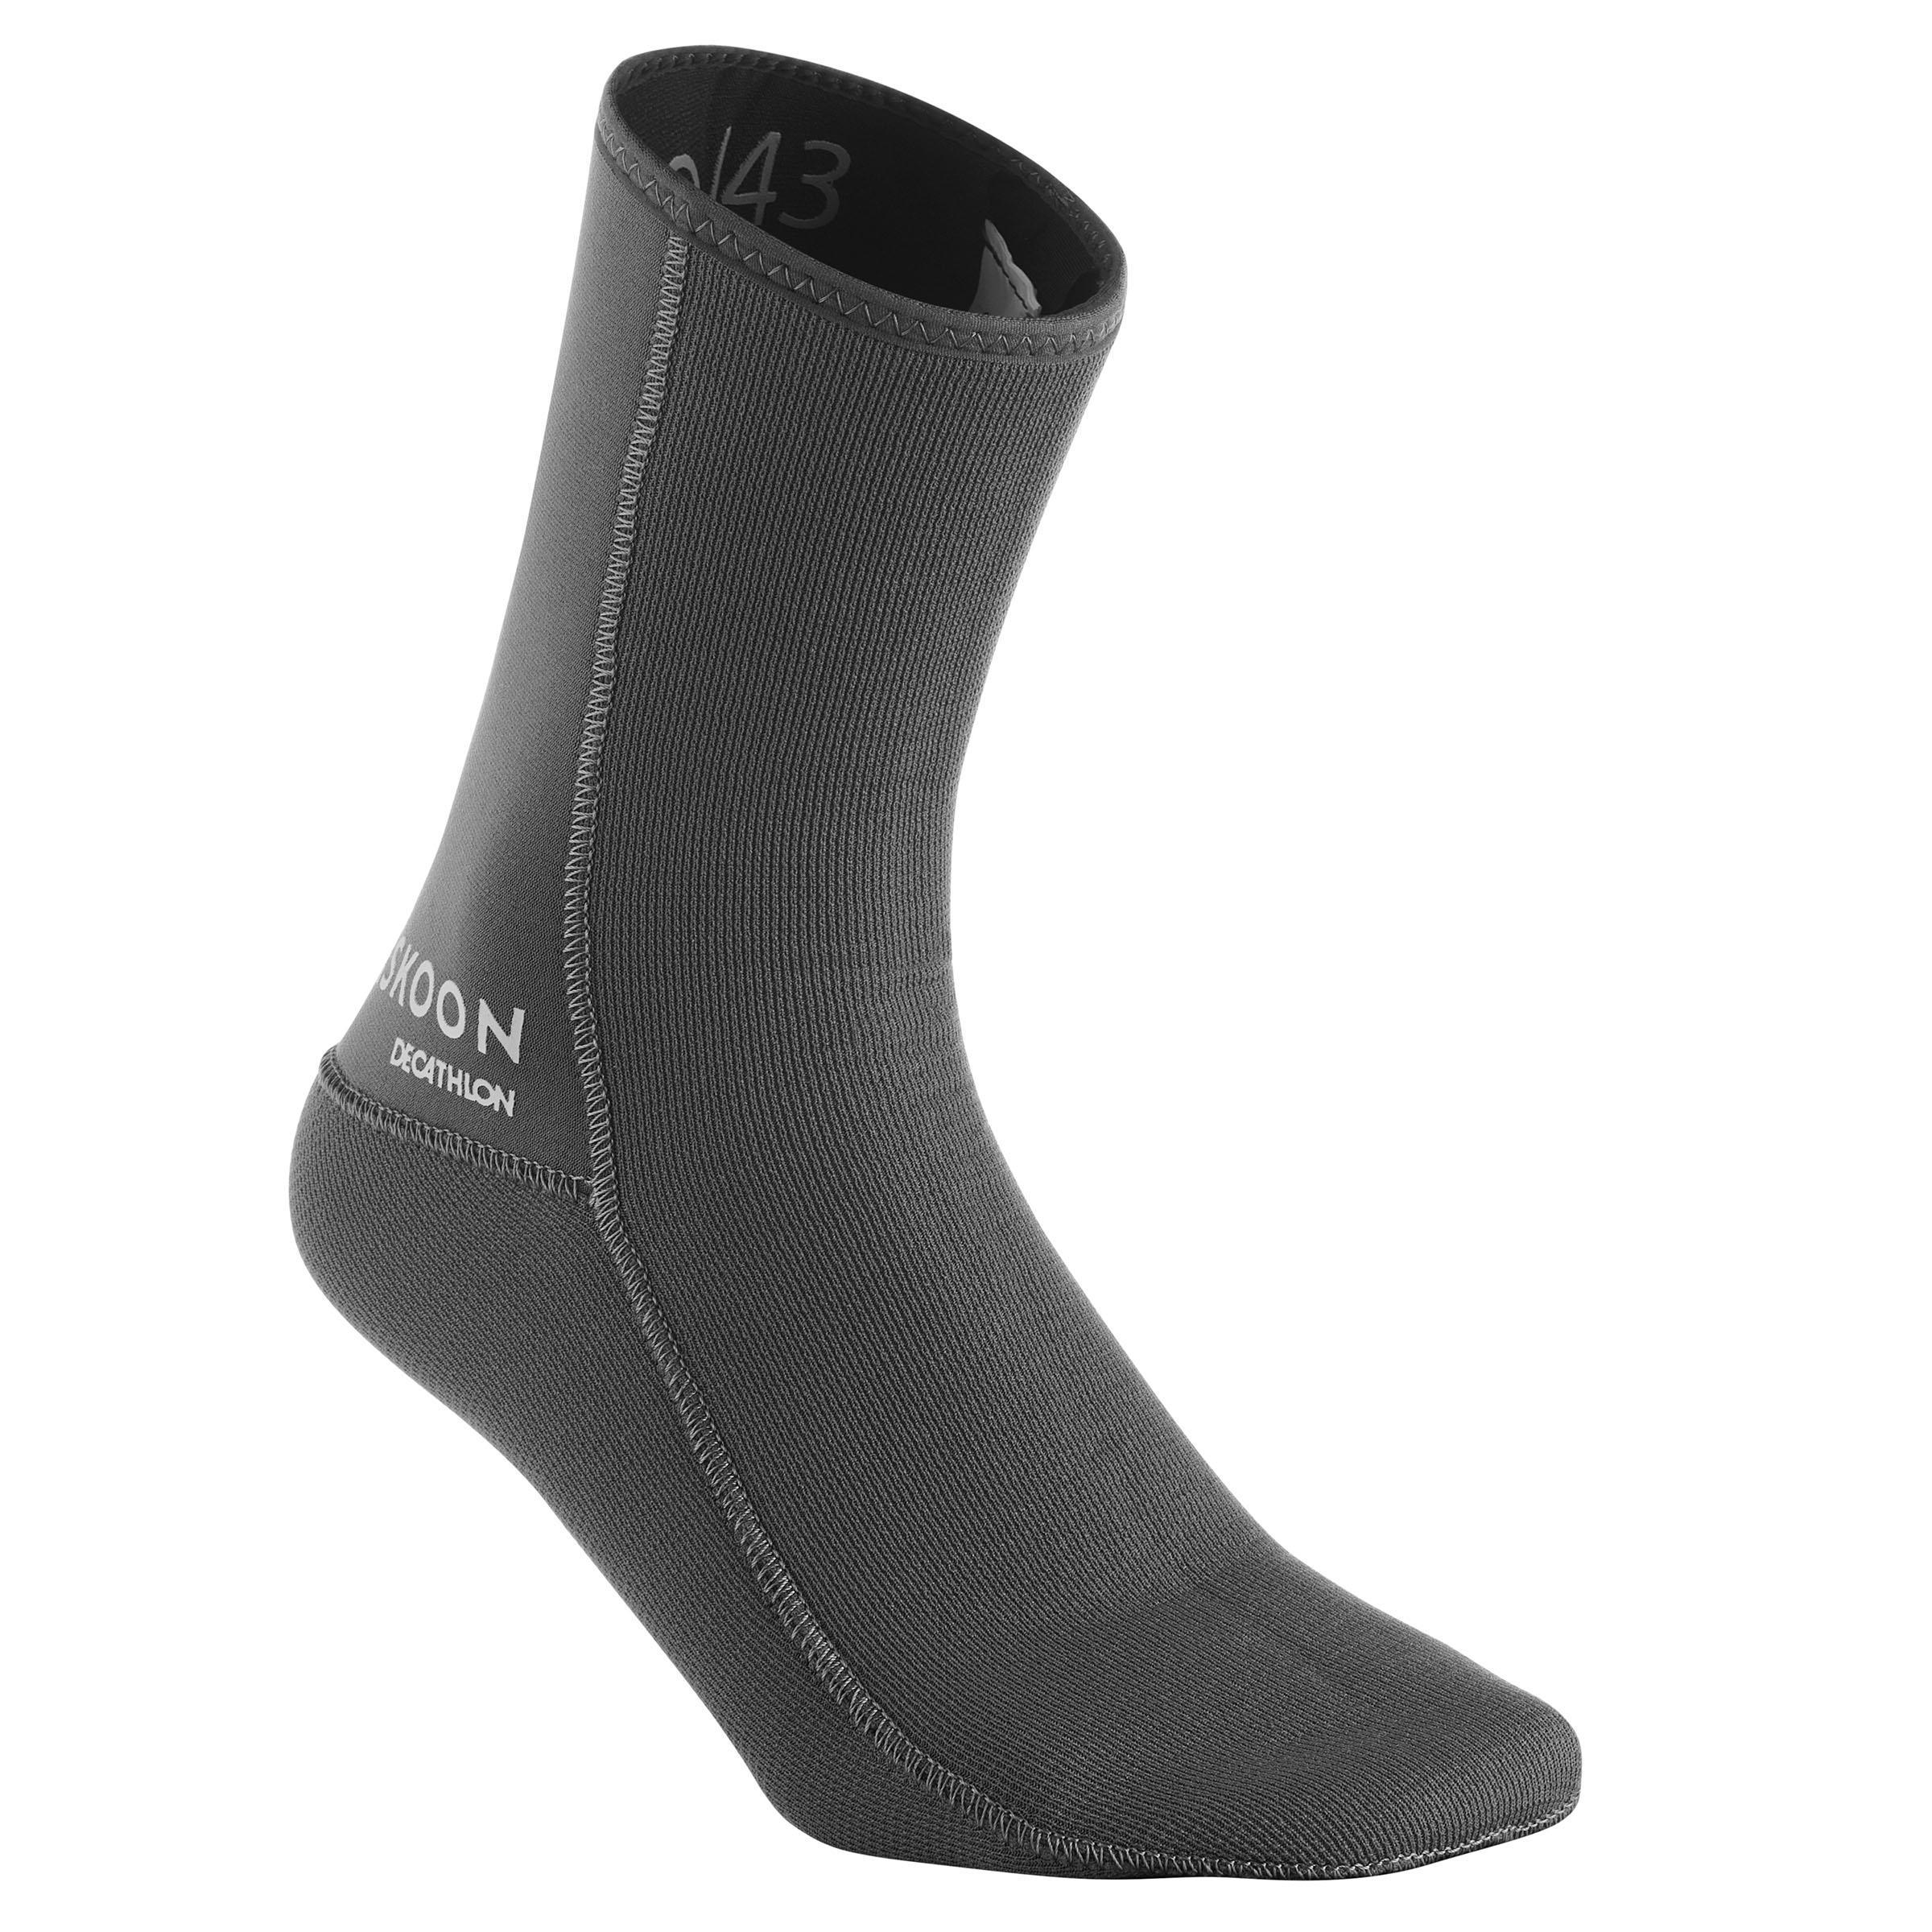 Canyoning-Neoprensocken 3mm grau unisex   Sportbekleidung > Funktionswäsche > Thermosocken   Grau - Blau   Maskoon